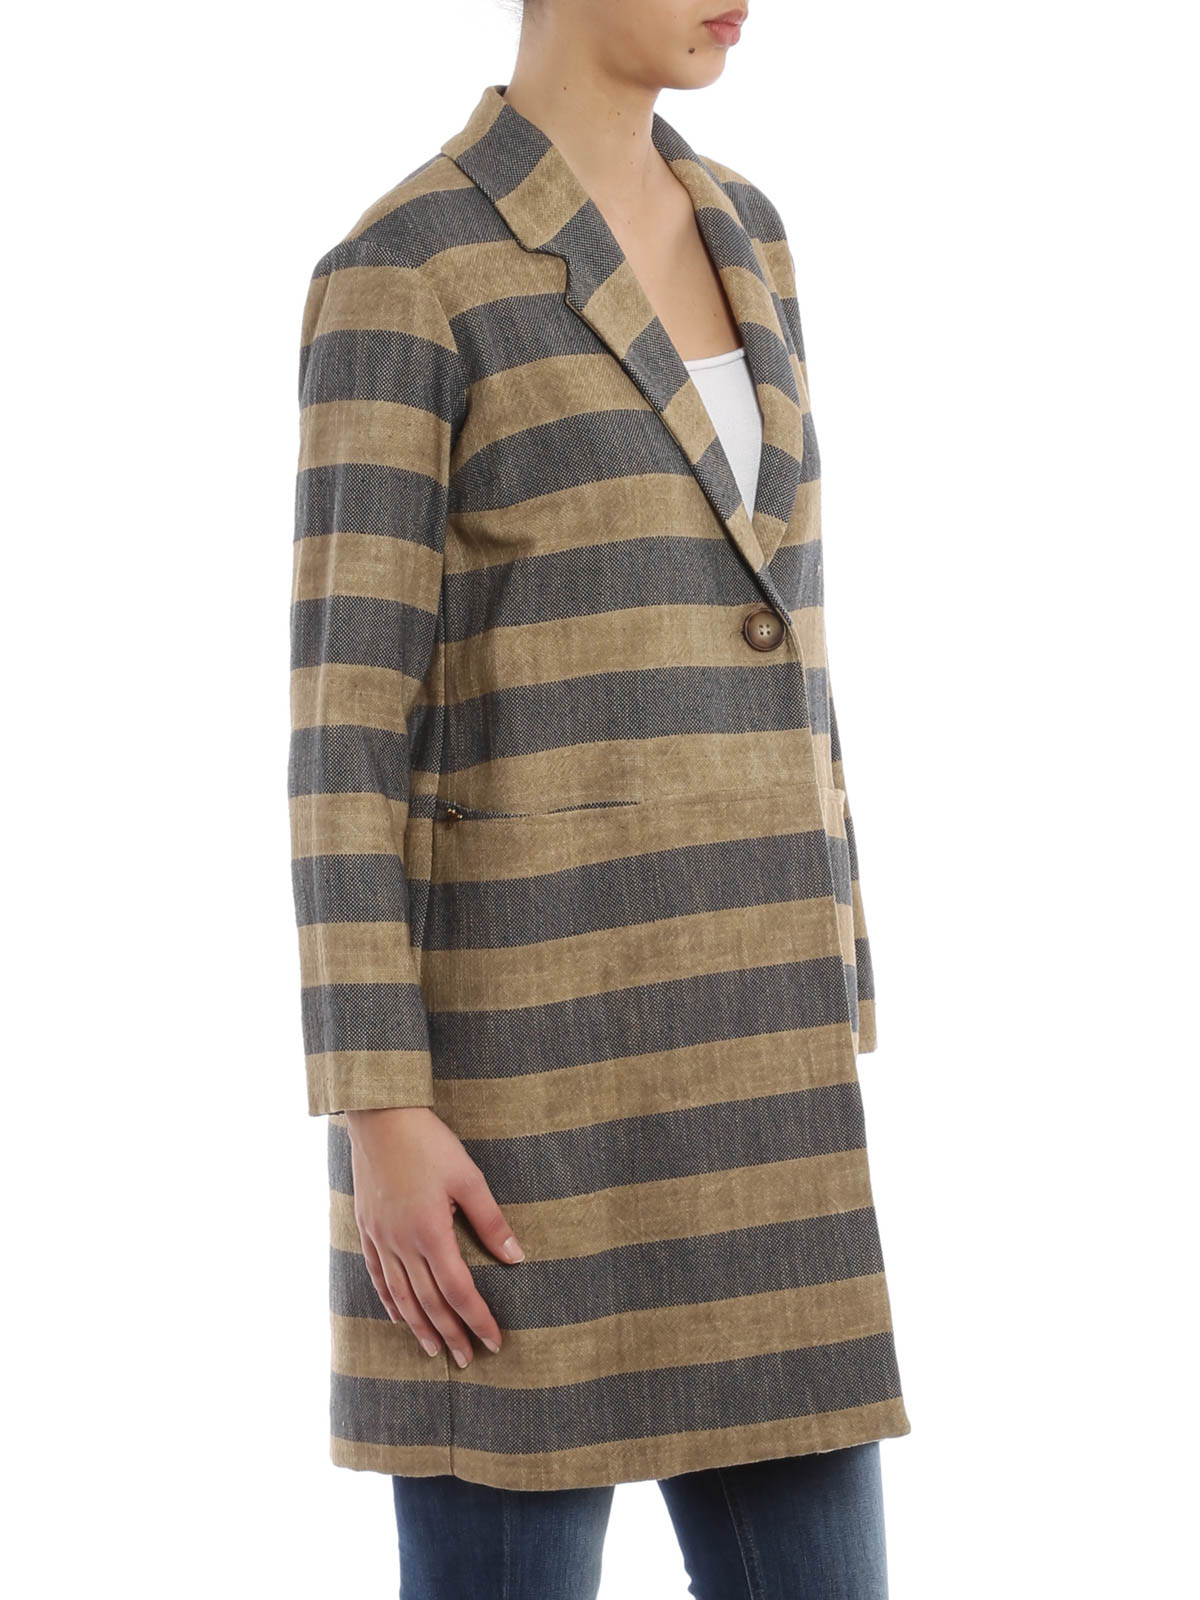 MEHRFARBIG Mantel Mantel Damen X1W5439011ERHG50163XTod's MEHRFARBIG iuTOPkXZ